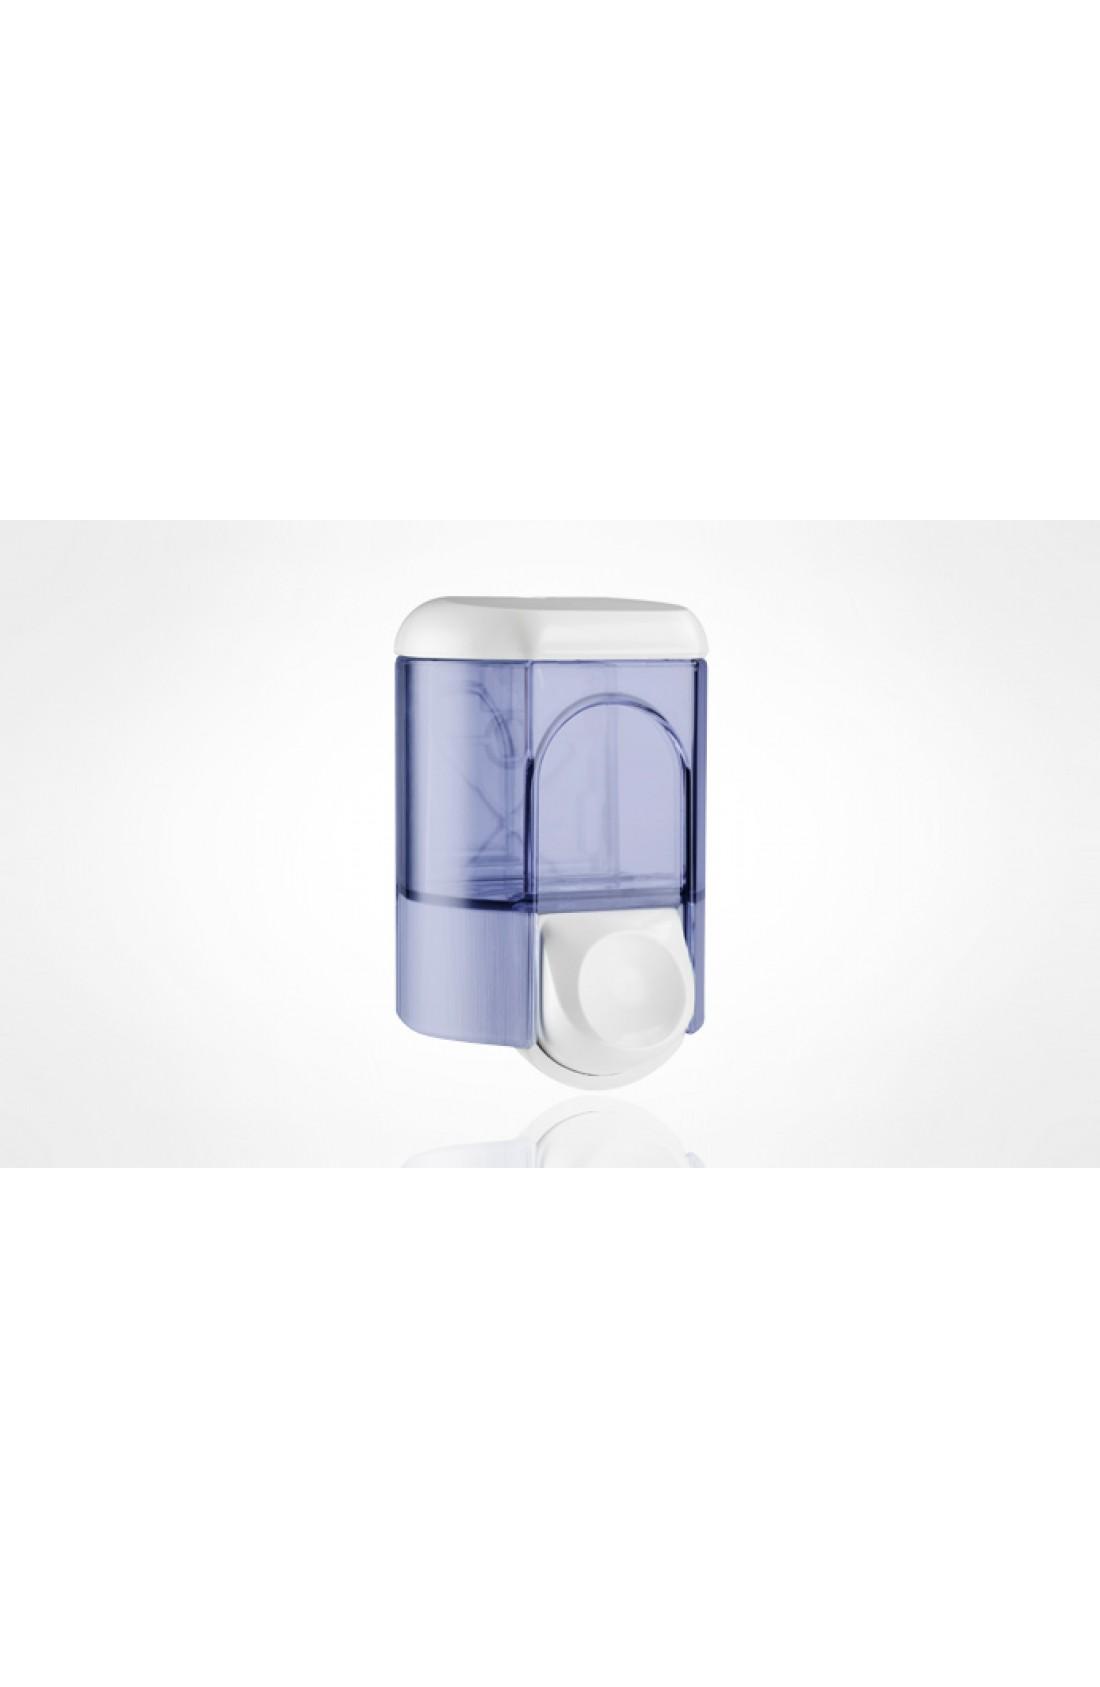 Dispenser sapone liquido bianco/trasparente